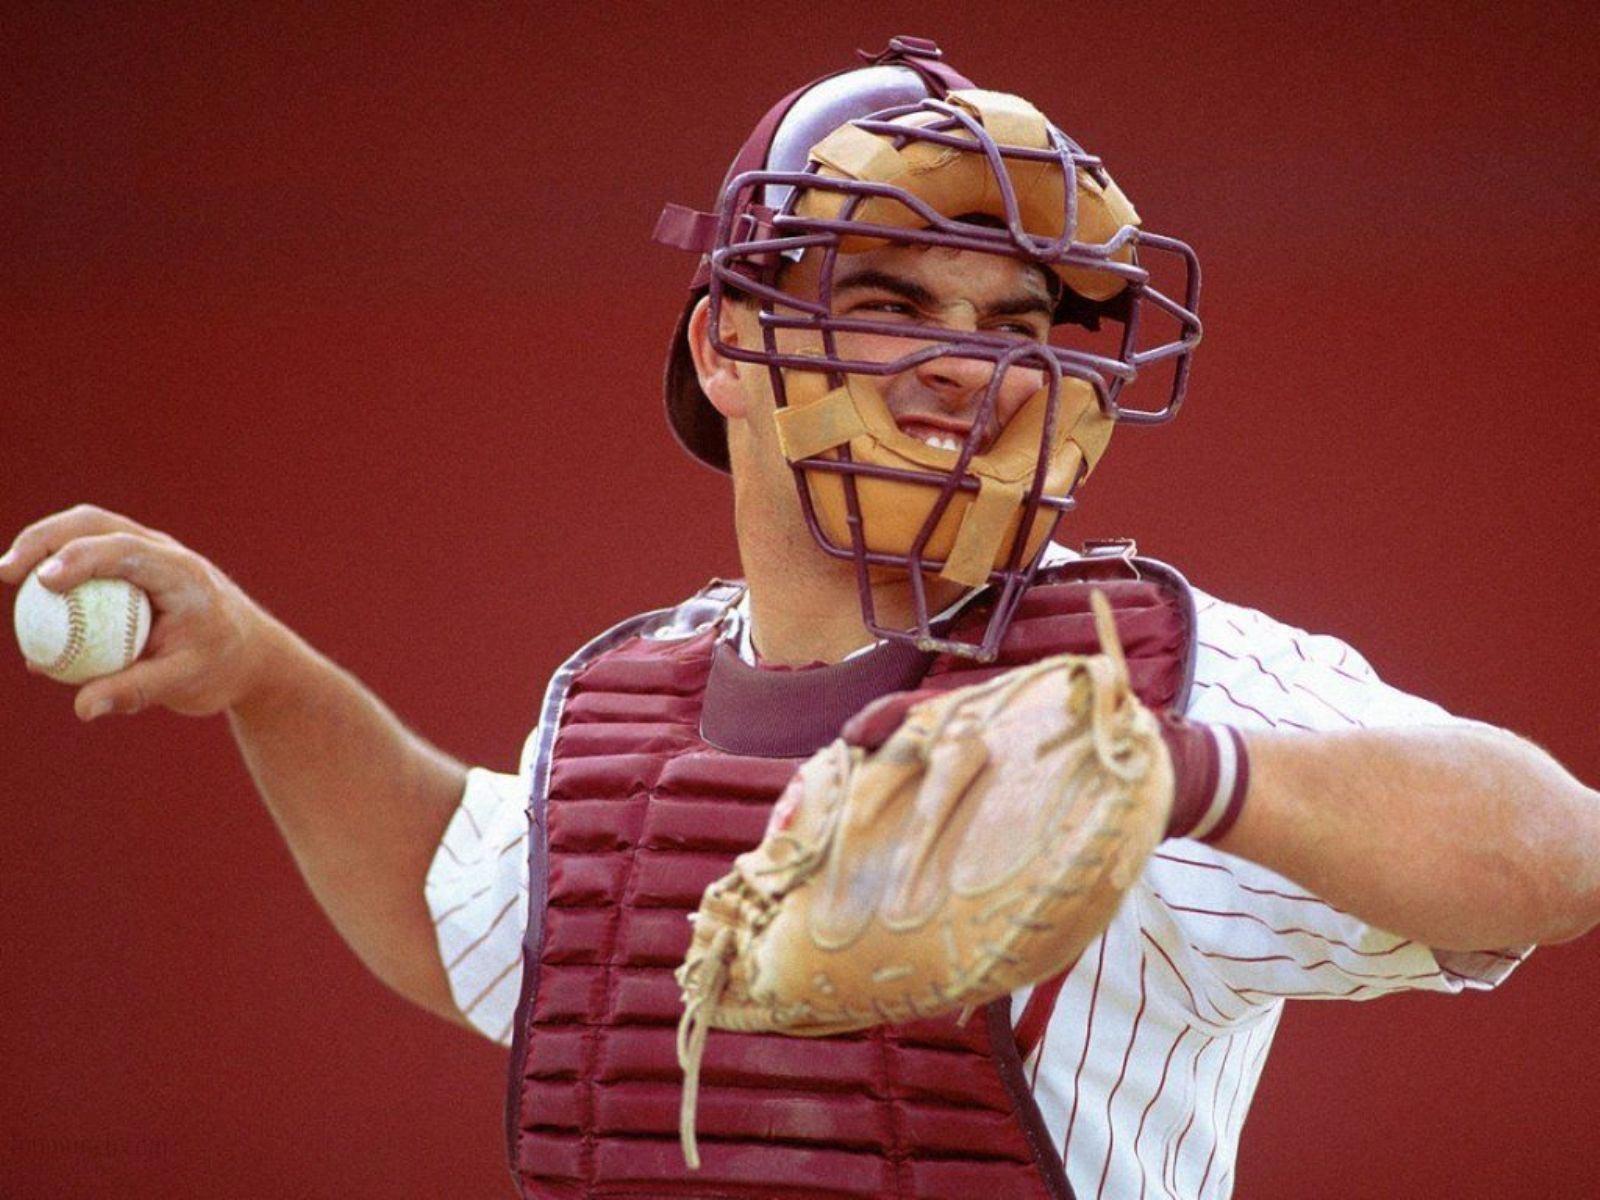 Baseball Player Throws Ball HD Wallpapers 1600x1200